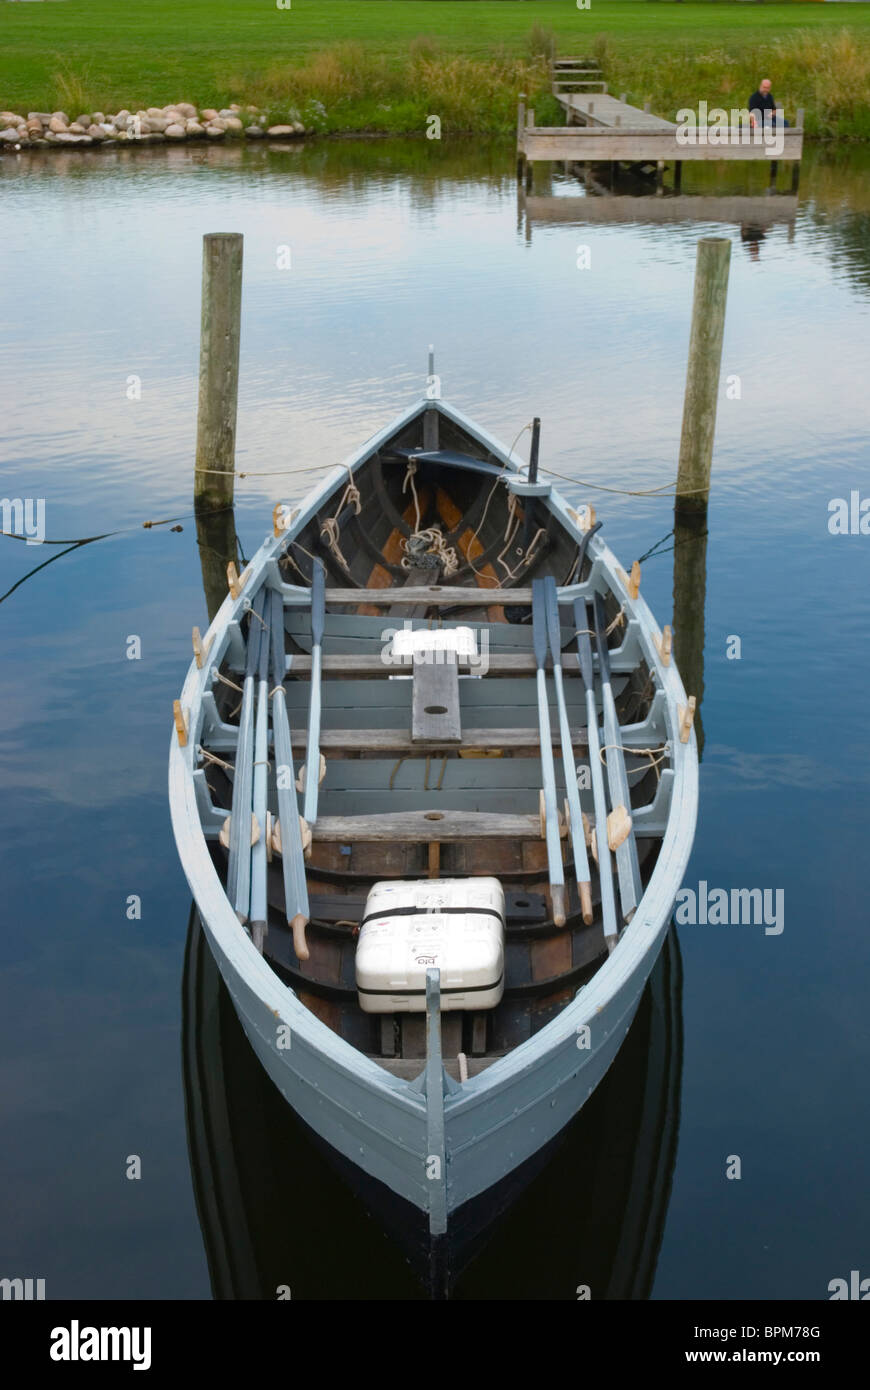 Replica of Blakman boat from Faroe Islands at Roskilde Fjord lake Roskilde Denmark Europe - Stock Image